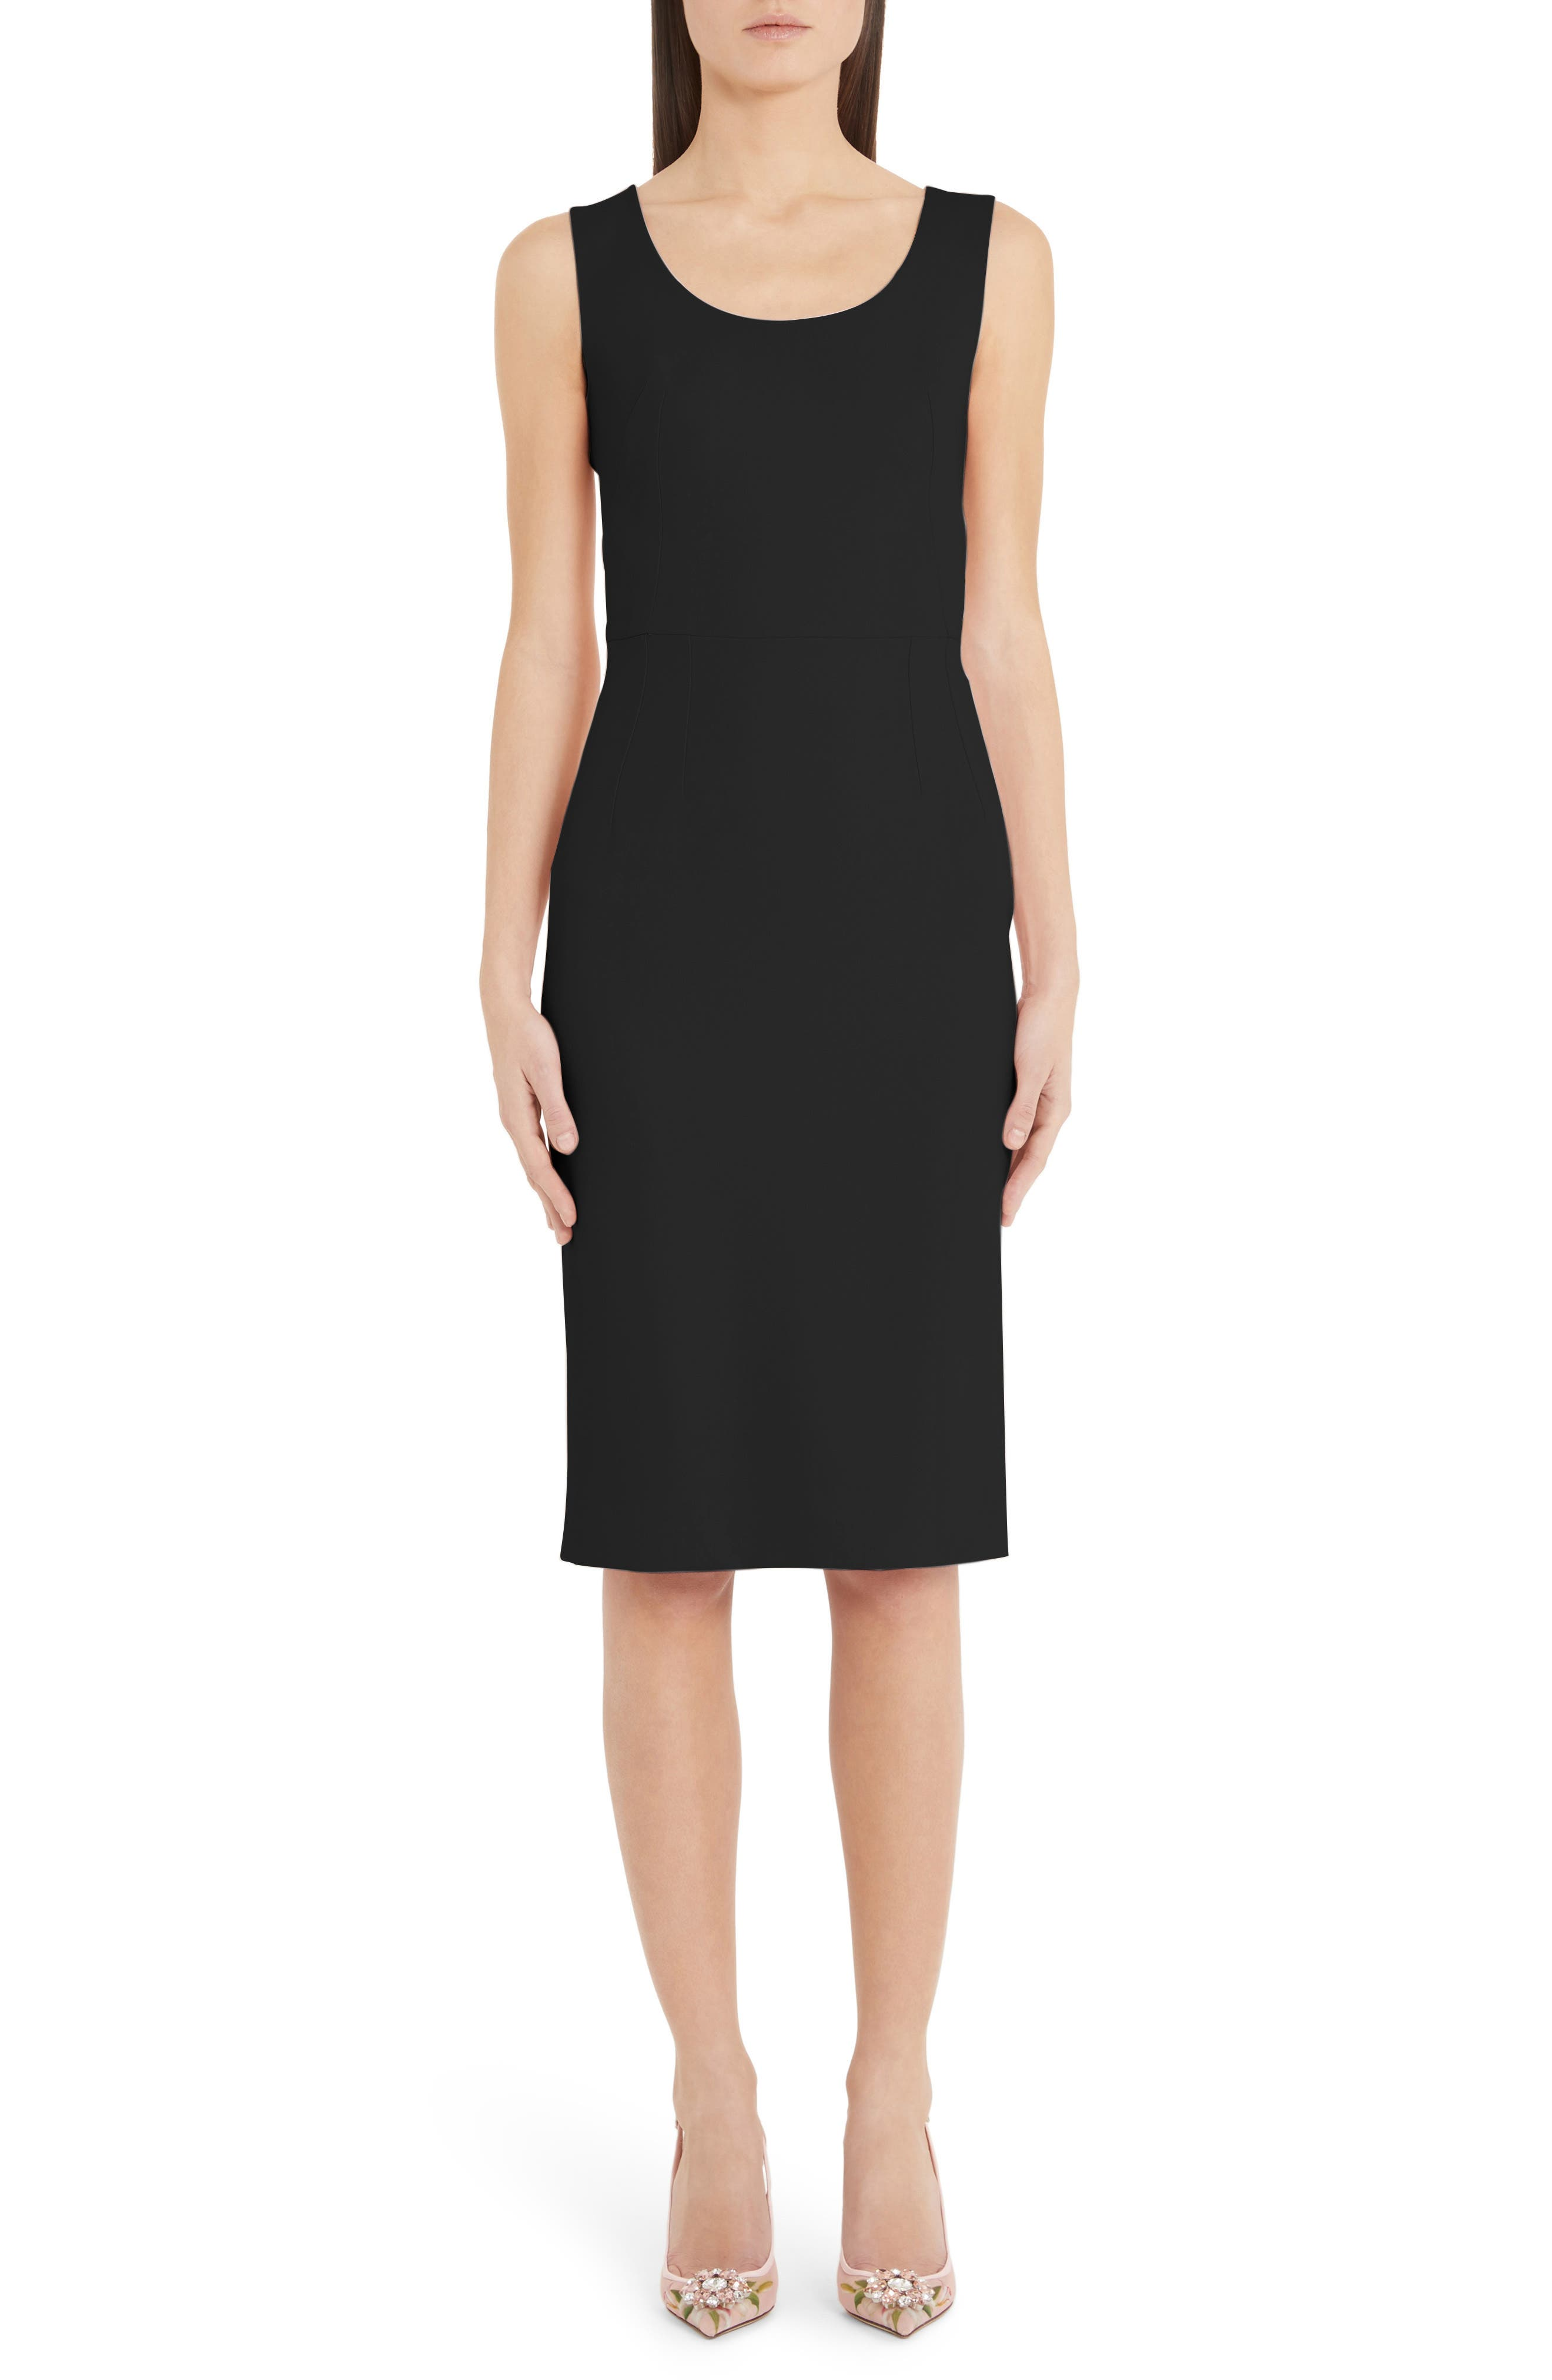 Dolce & gabbana Scoop Neck Sheath Dress, 8 IT - Black